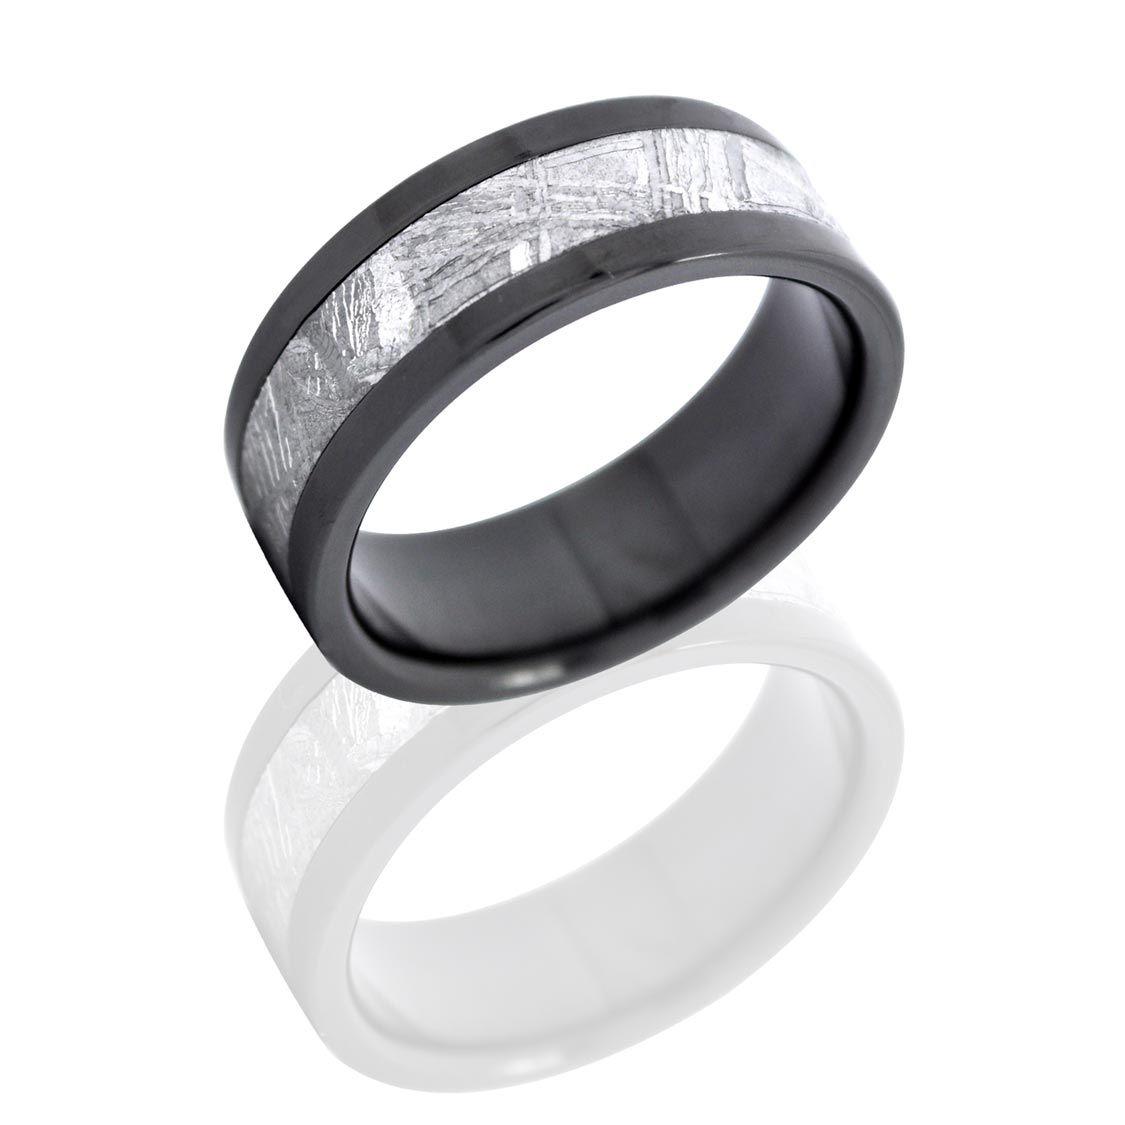 Mens Meteorite Wedding Ring synrgyus